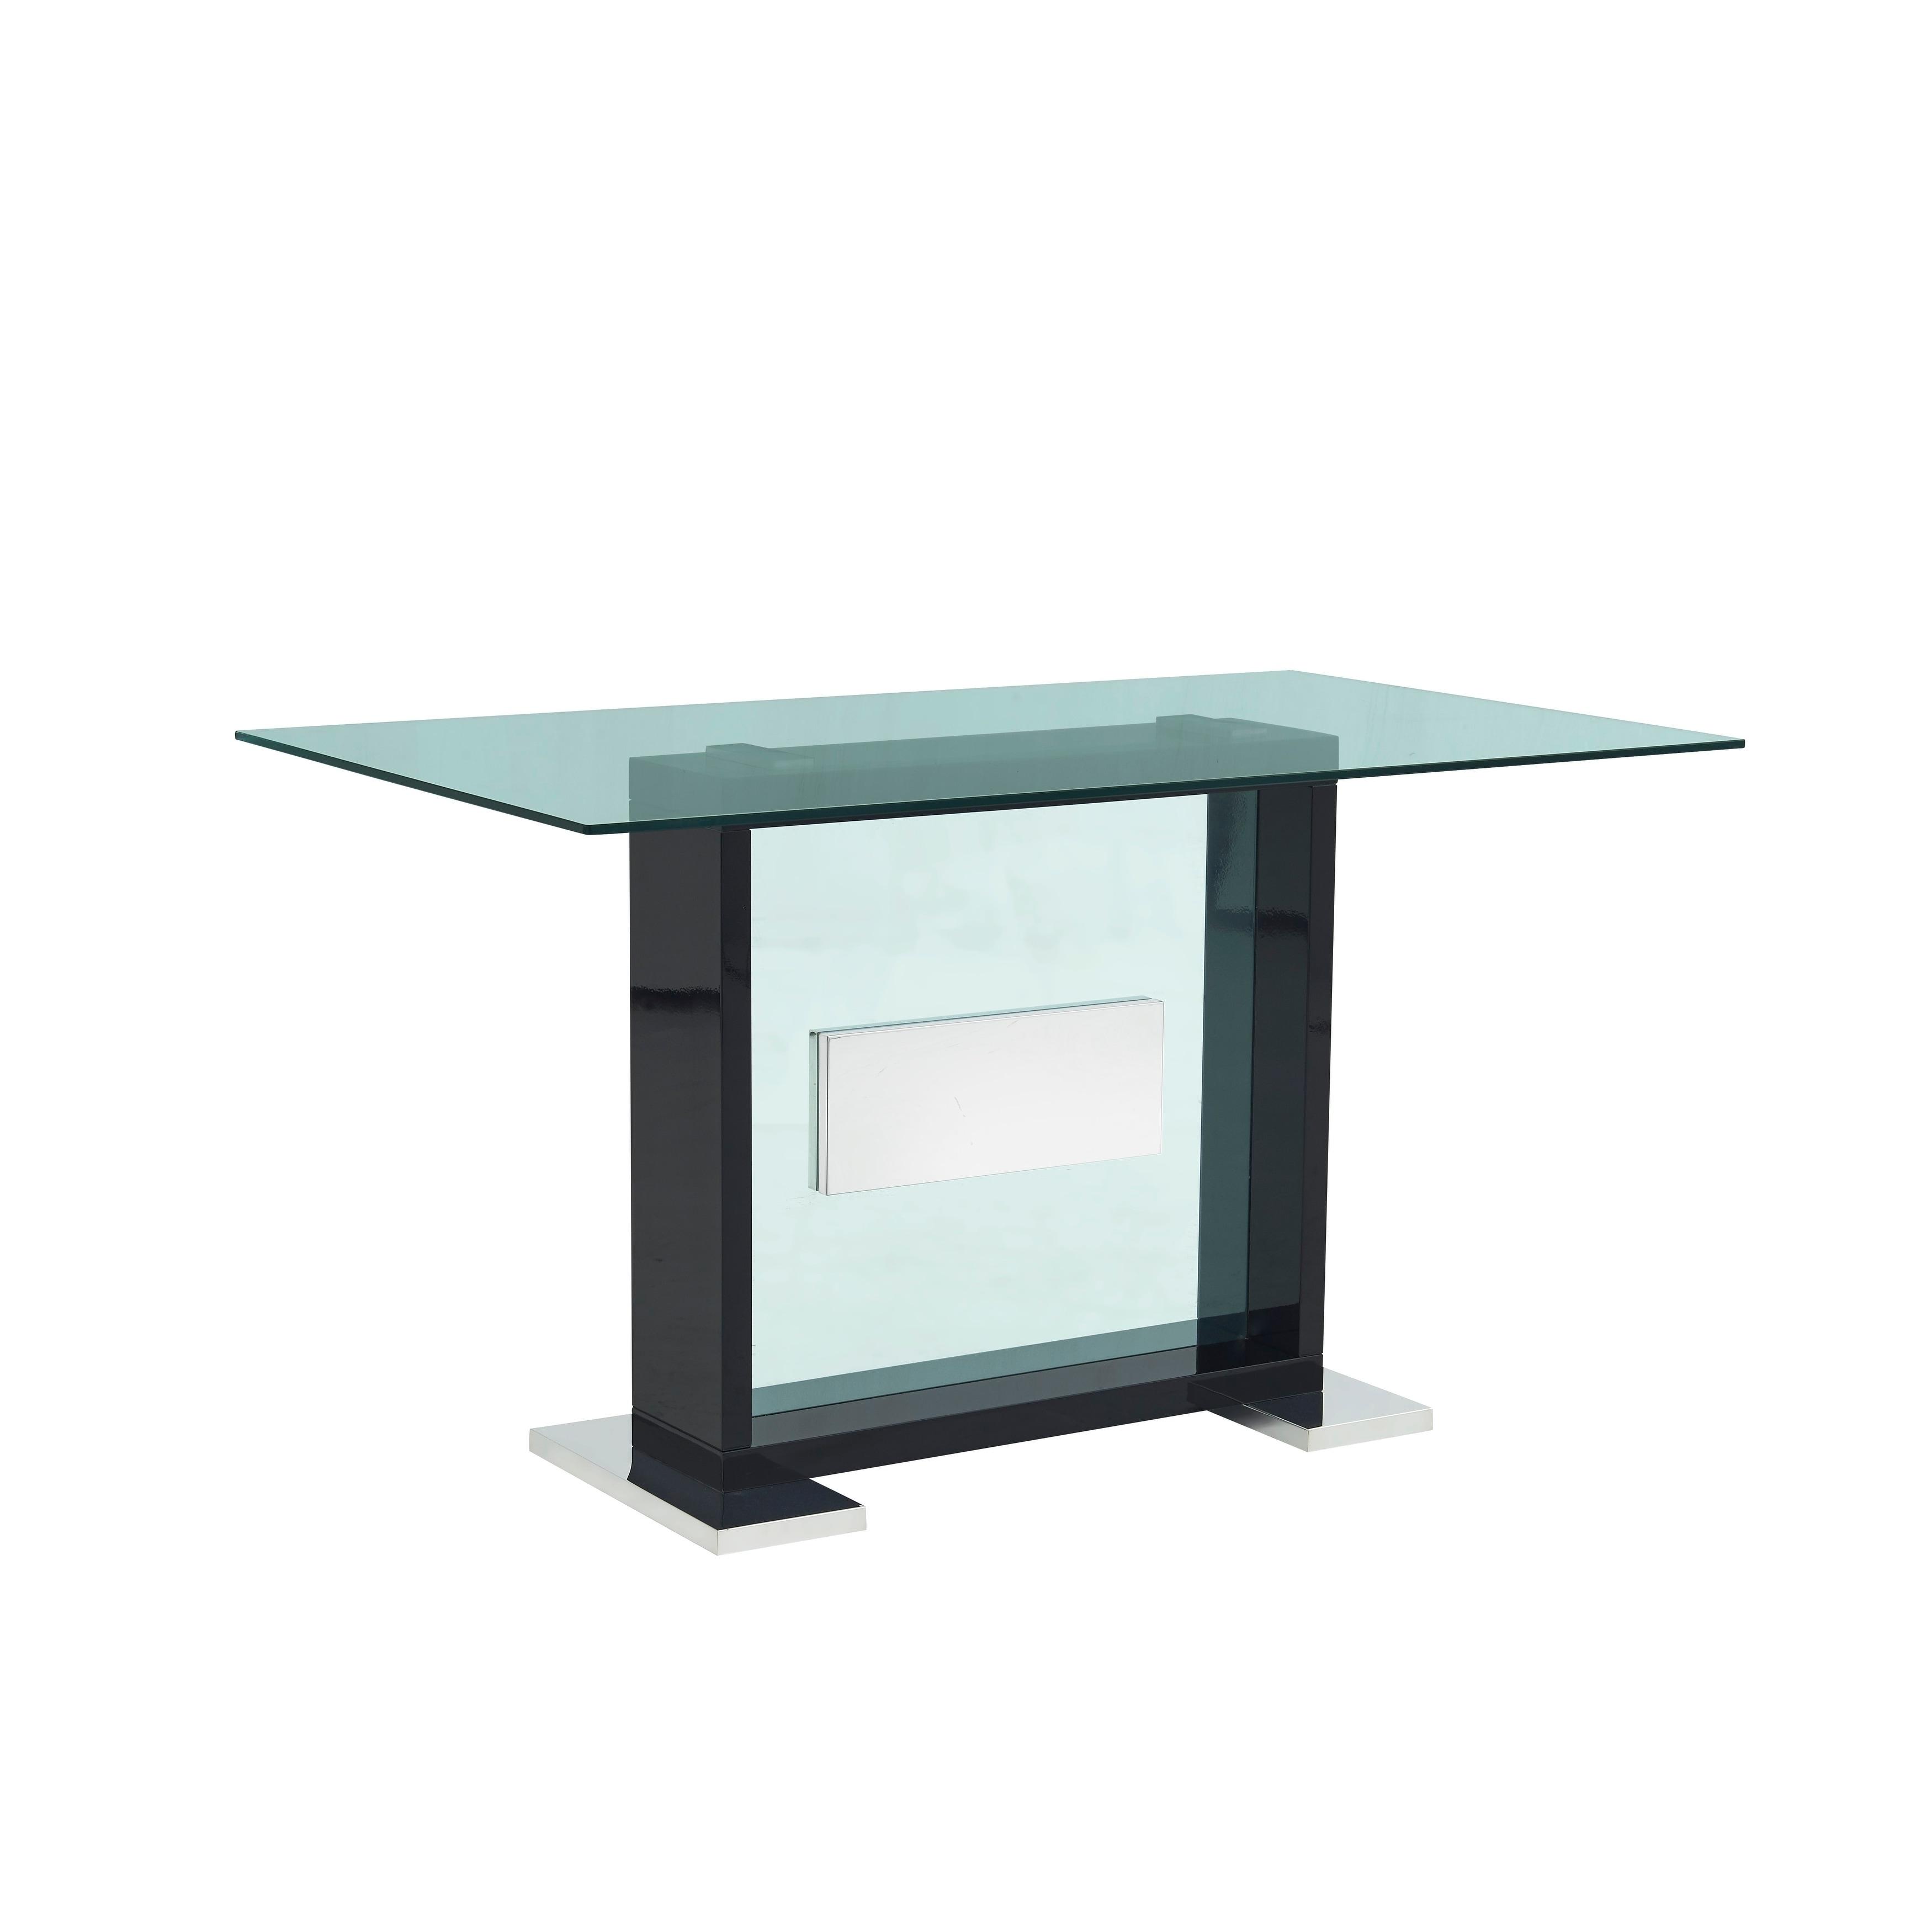 Gl Top Contemporary Black Bar Table